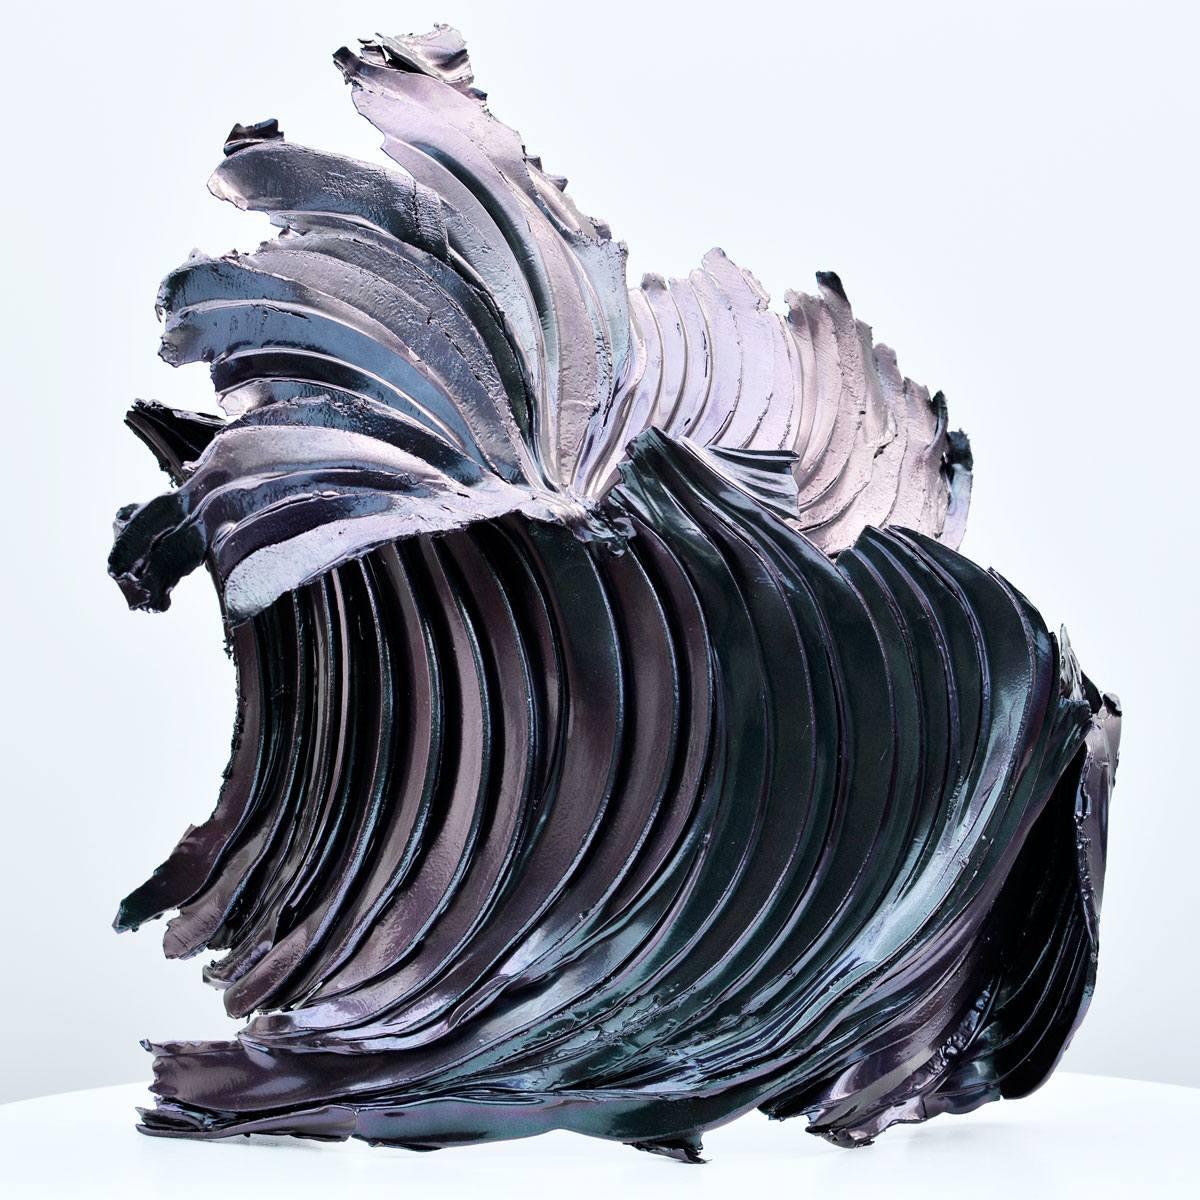 two-tone-light-reactive-metal-sculpture-4